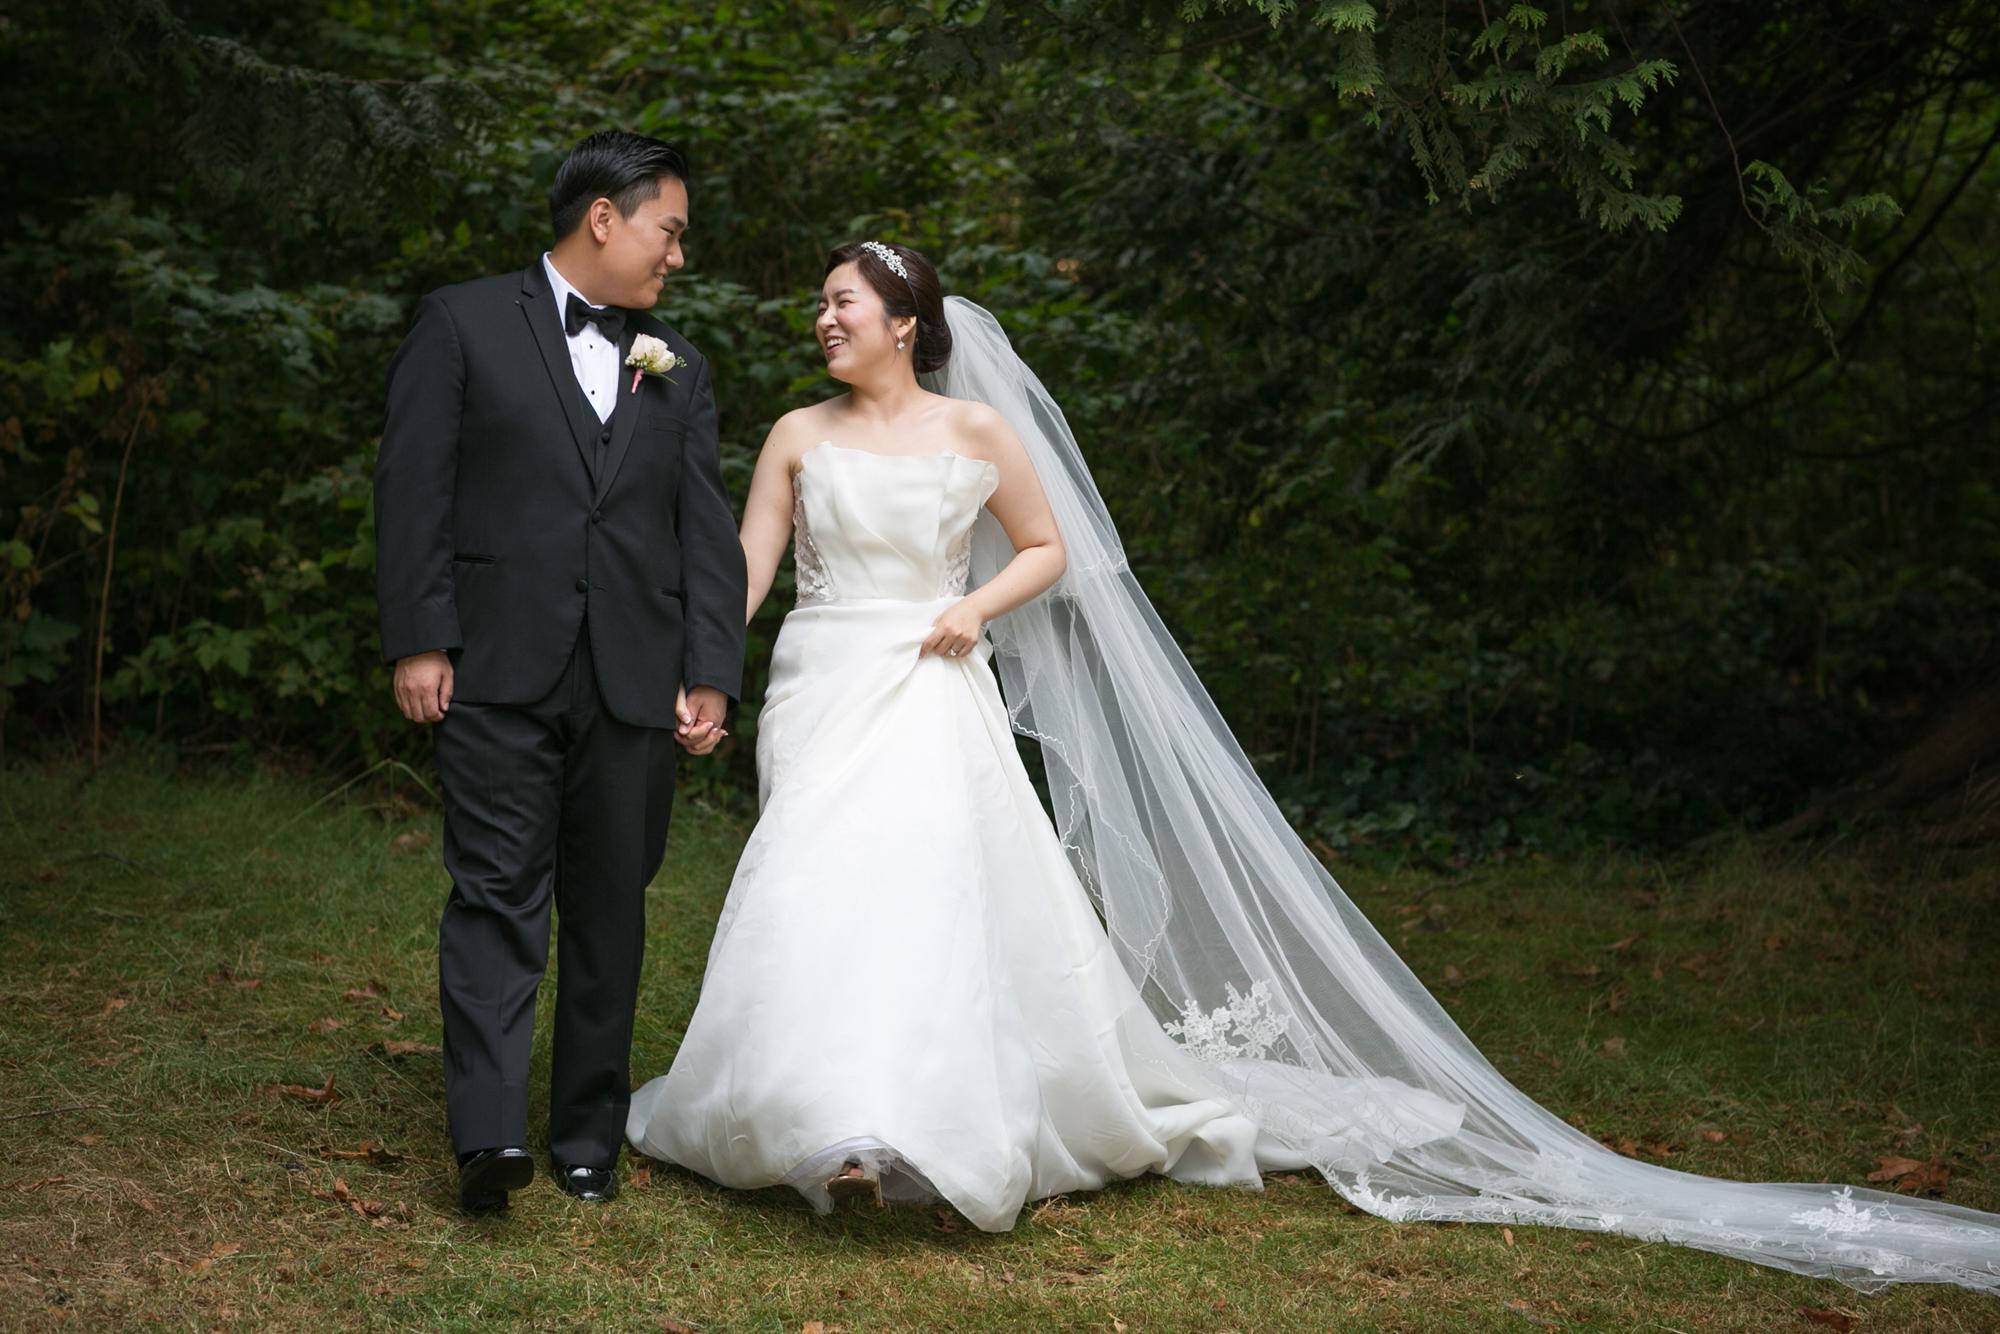 vancouver-luxury-wedding-photographer-lori-miles--14.jpg